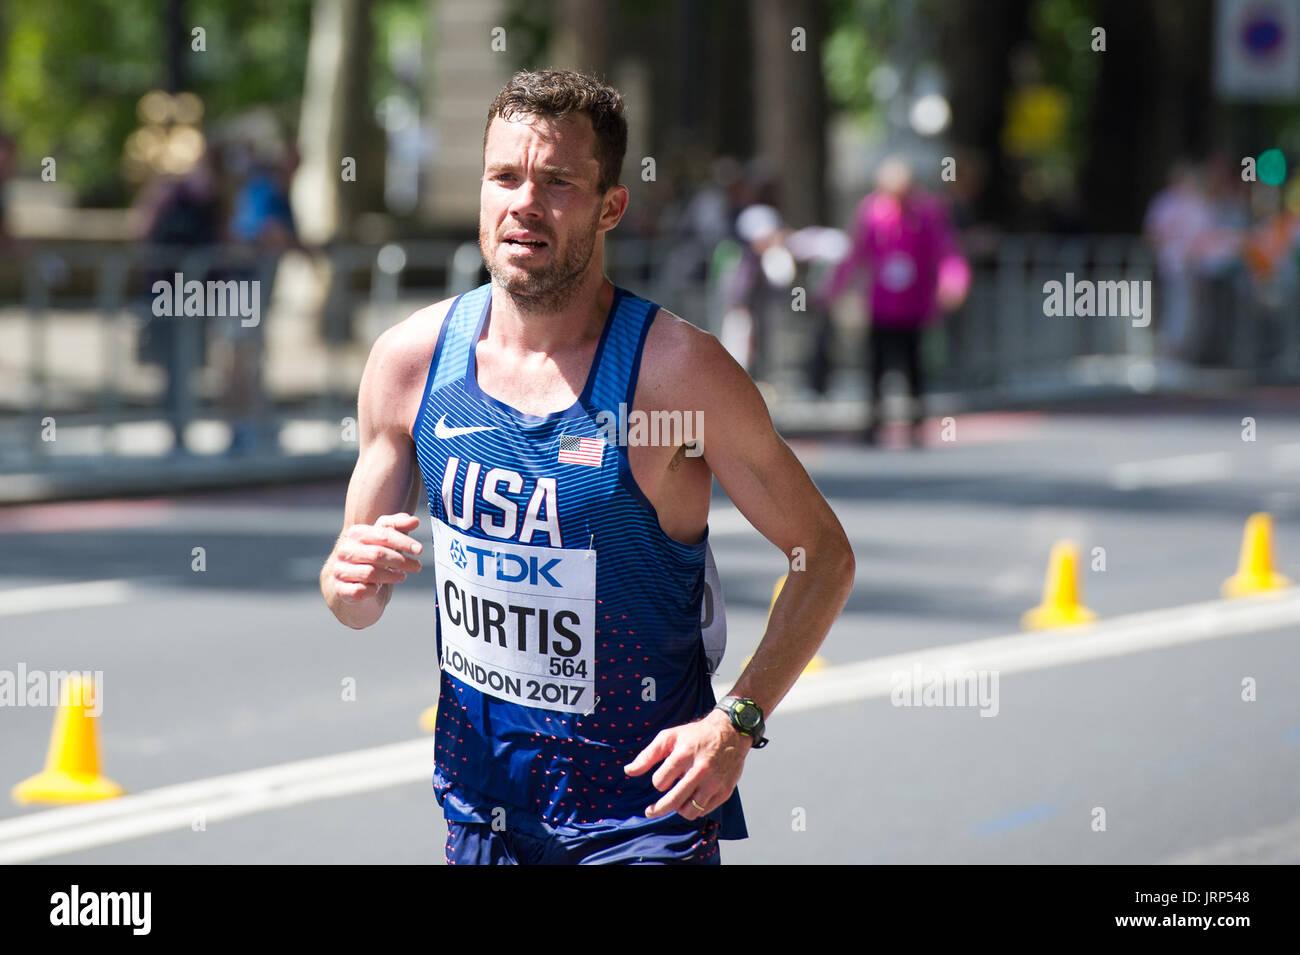 London, UK. 6th August, 2017. Robert Curtis (USA) at the IAAF World Athletics Championships Men's Marathon Race Credit: Phil Swallow Photography/Alamy Live News - Stock Image